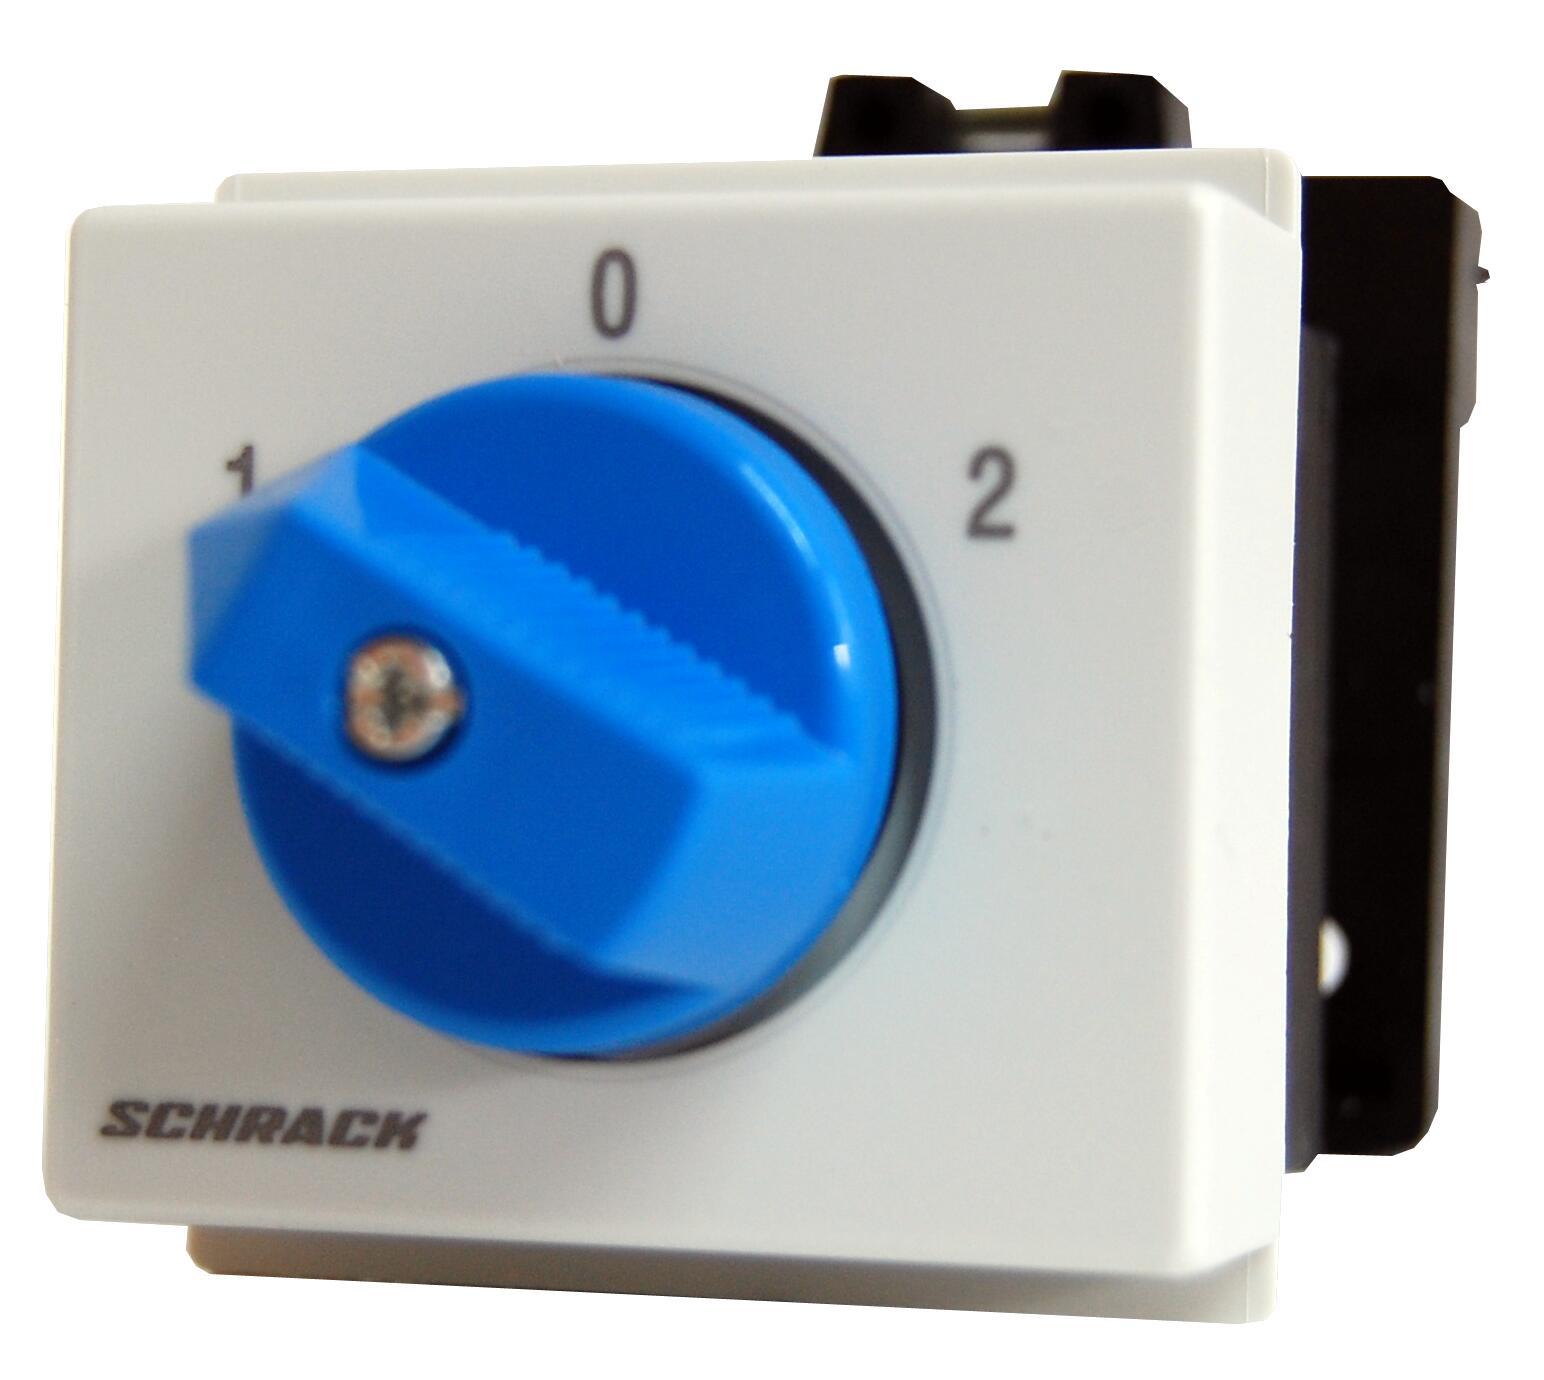 IN086220 - Schrack Technik